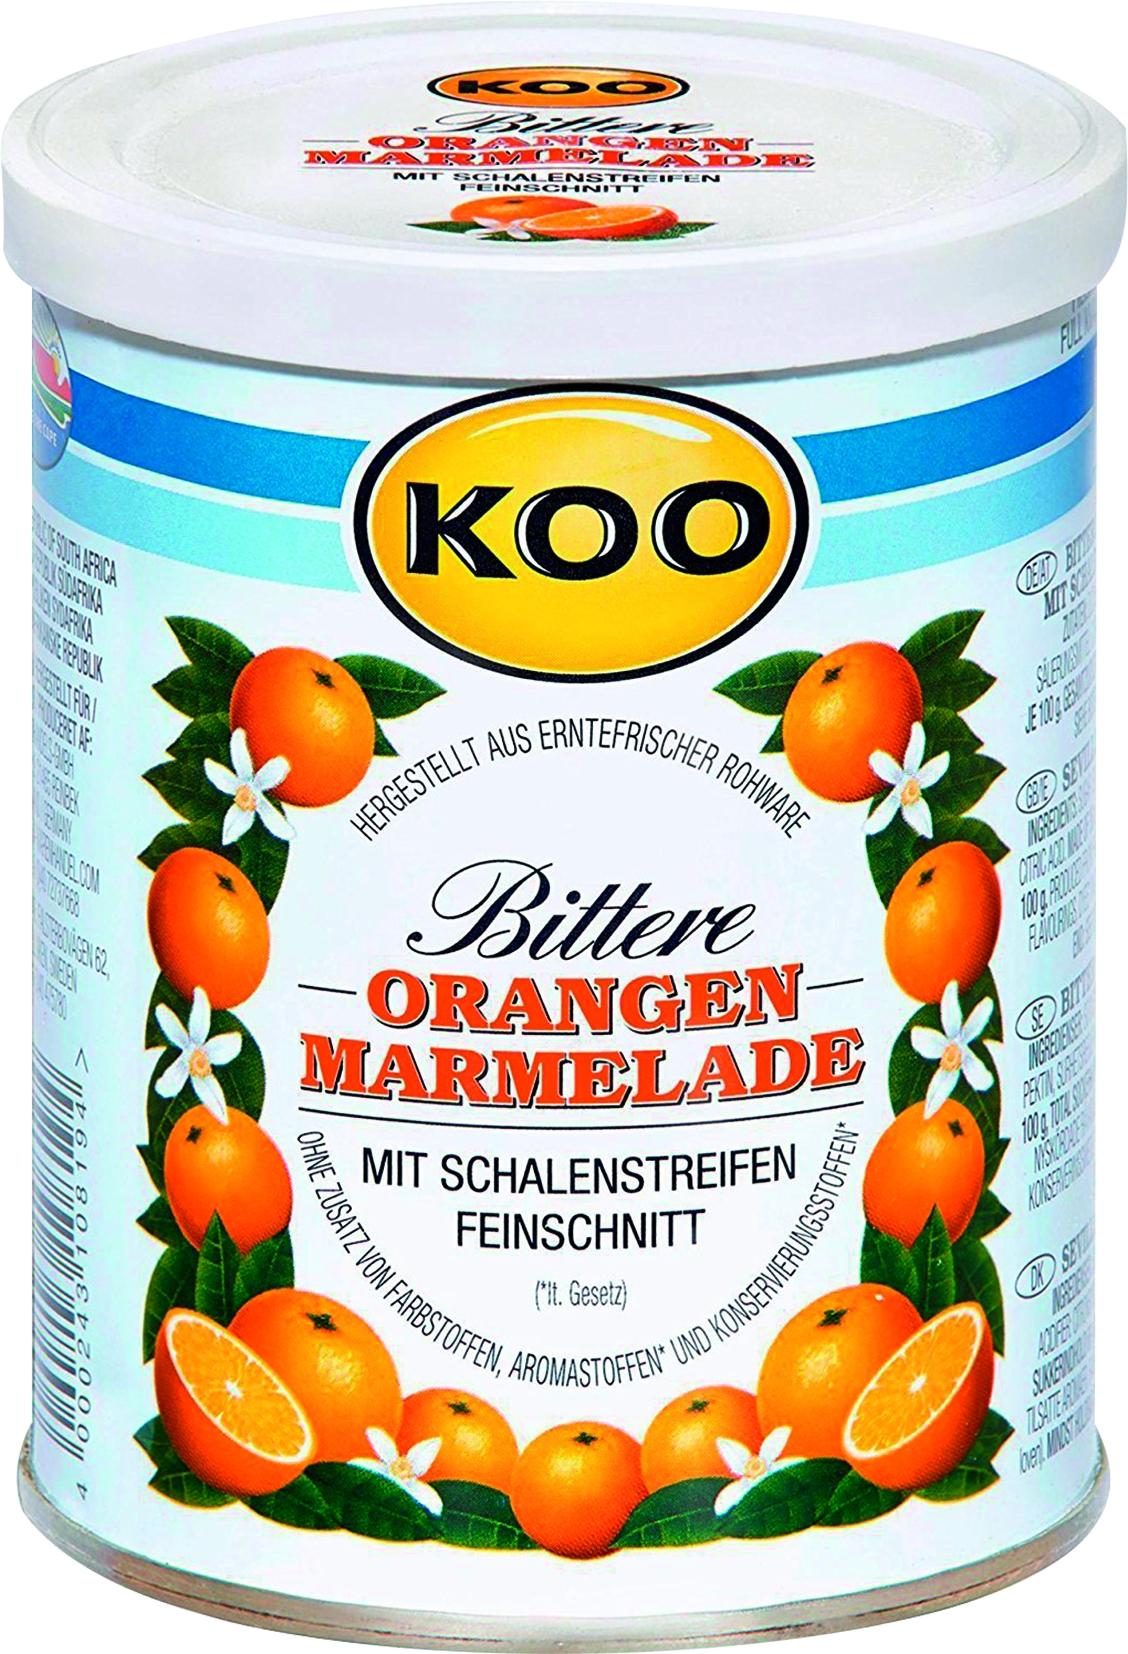 Bittere Orangemarmelade